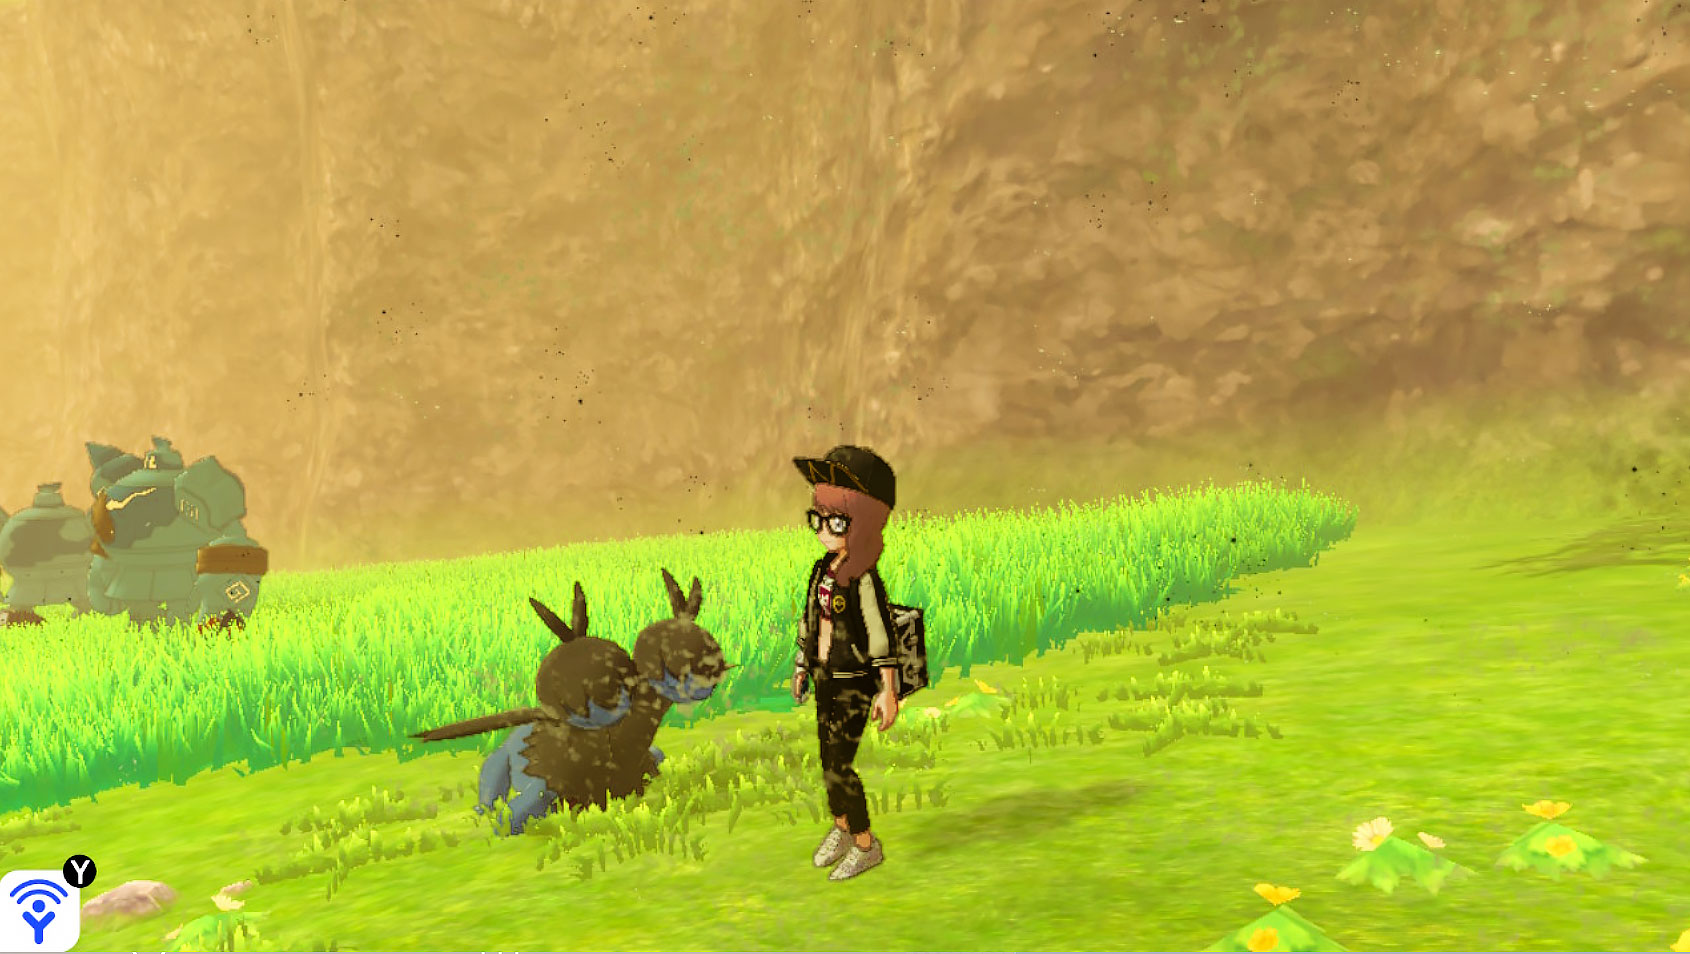 Hydreigon in the wild pokemon sword shield